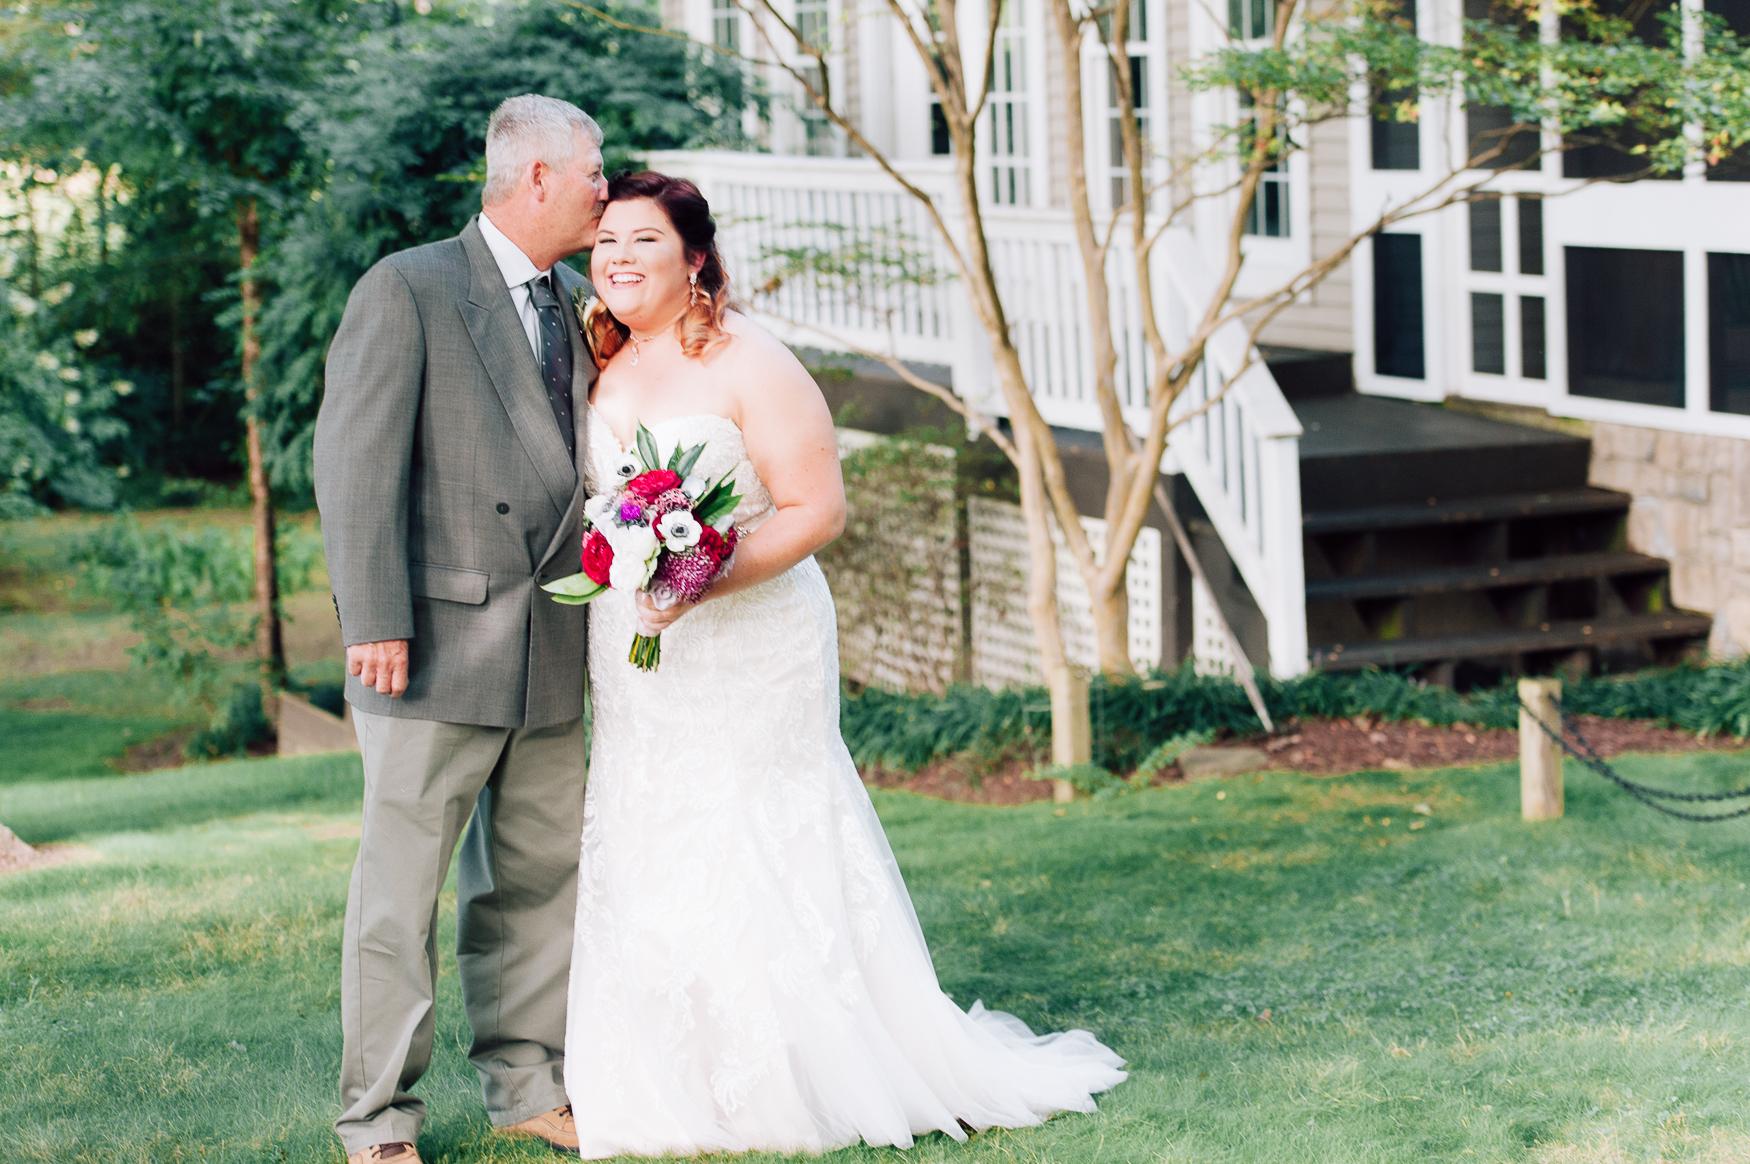 virginiawedding_GlenGarden_rusticwedding_fredericksburg_youseephotography_KellySteven (20).jpg